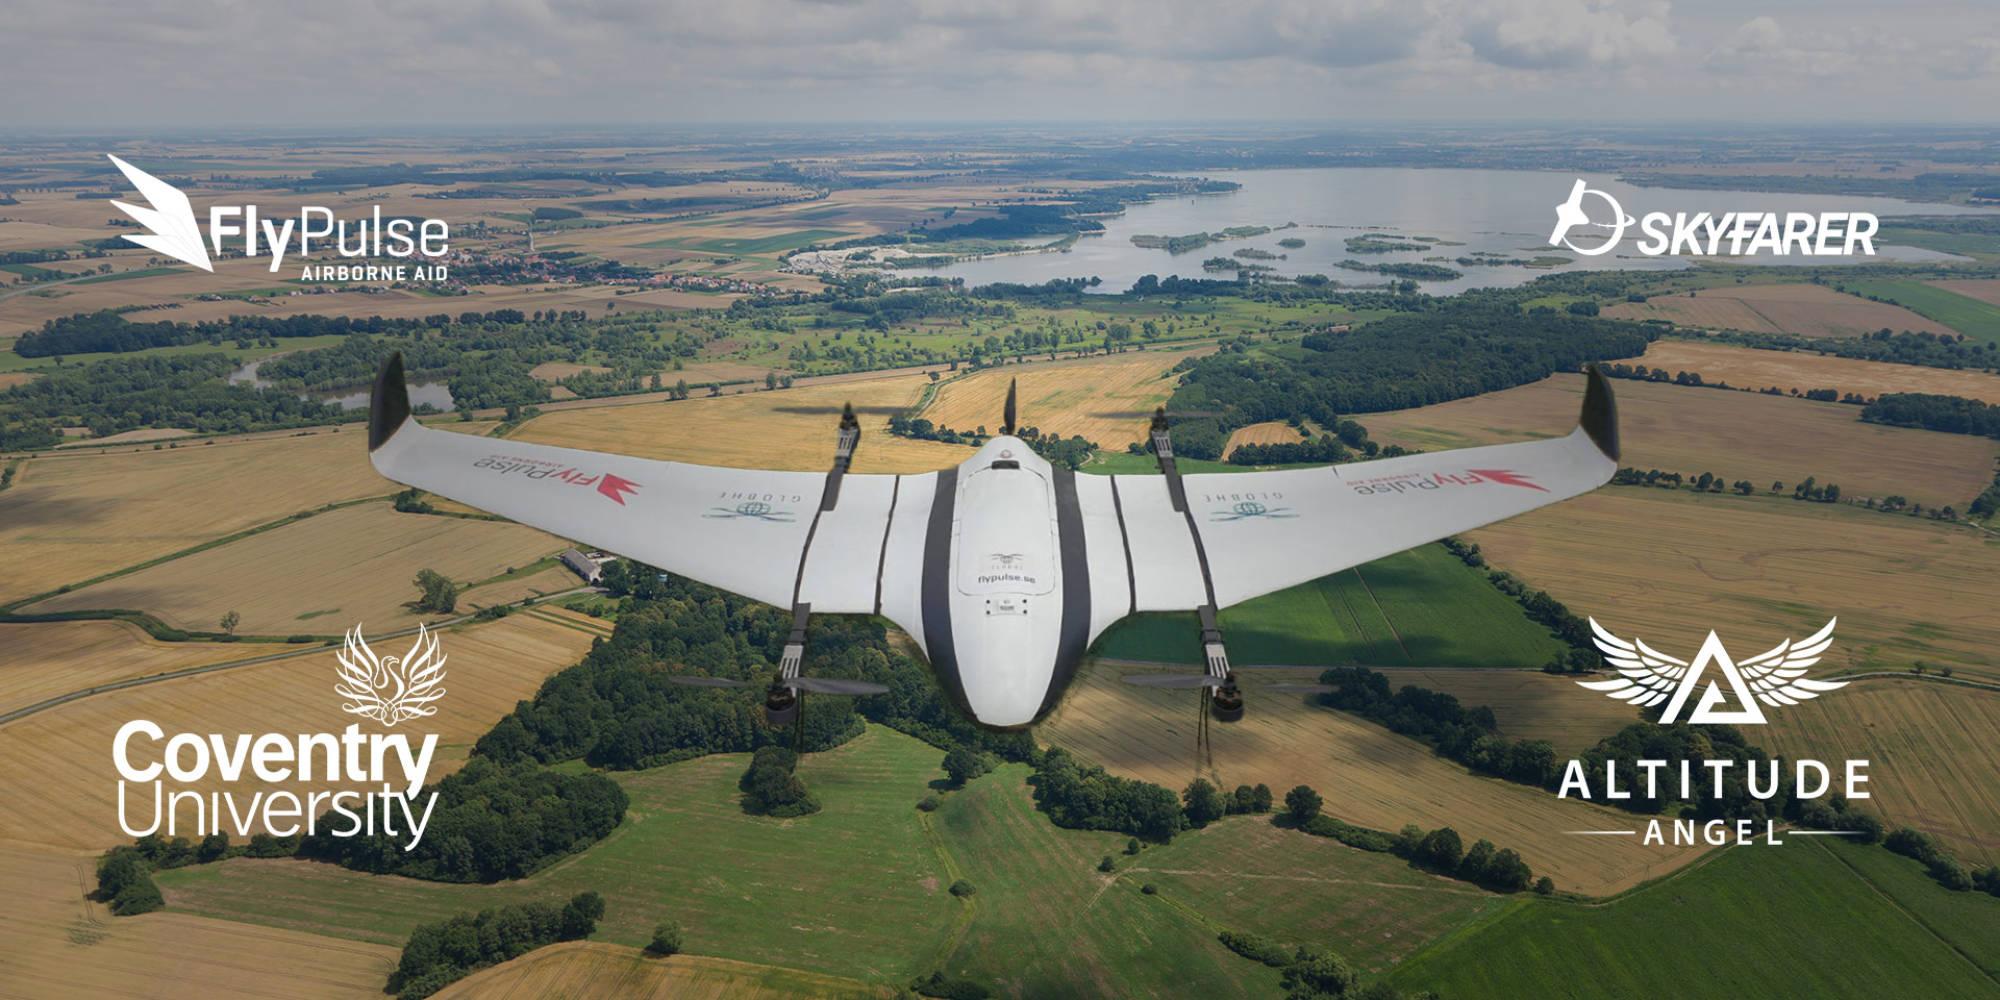 Altitude Angel partners to create drone delivery corridor - DroneDJ